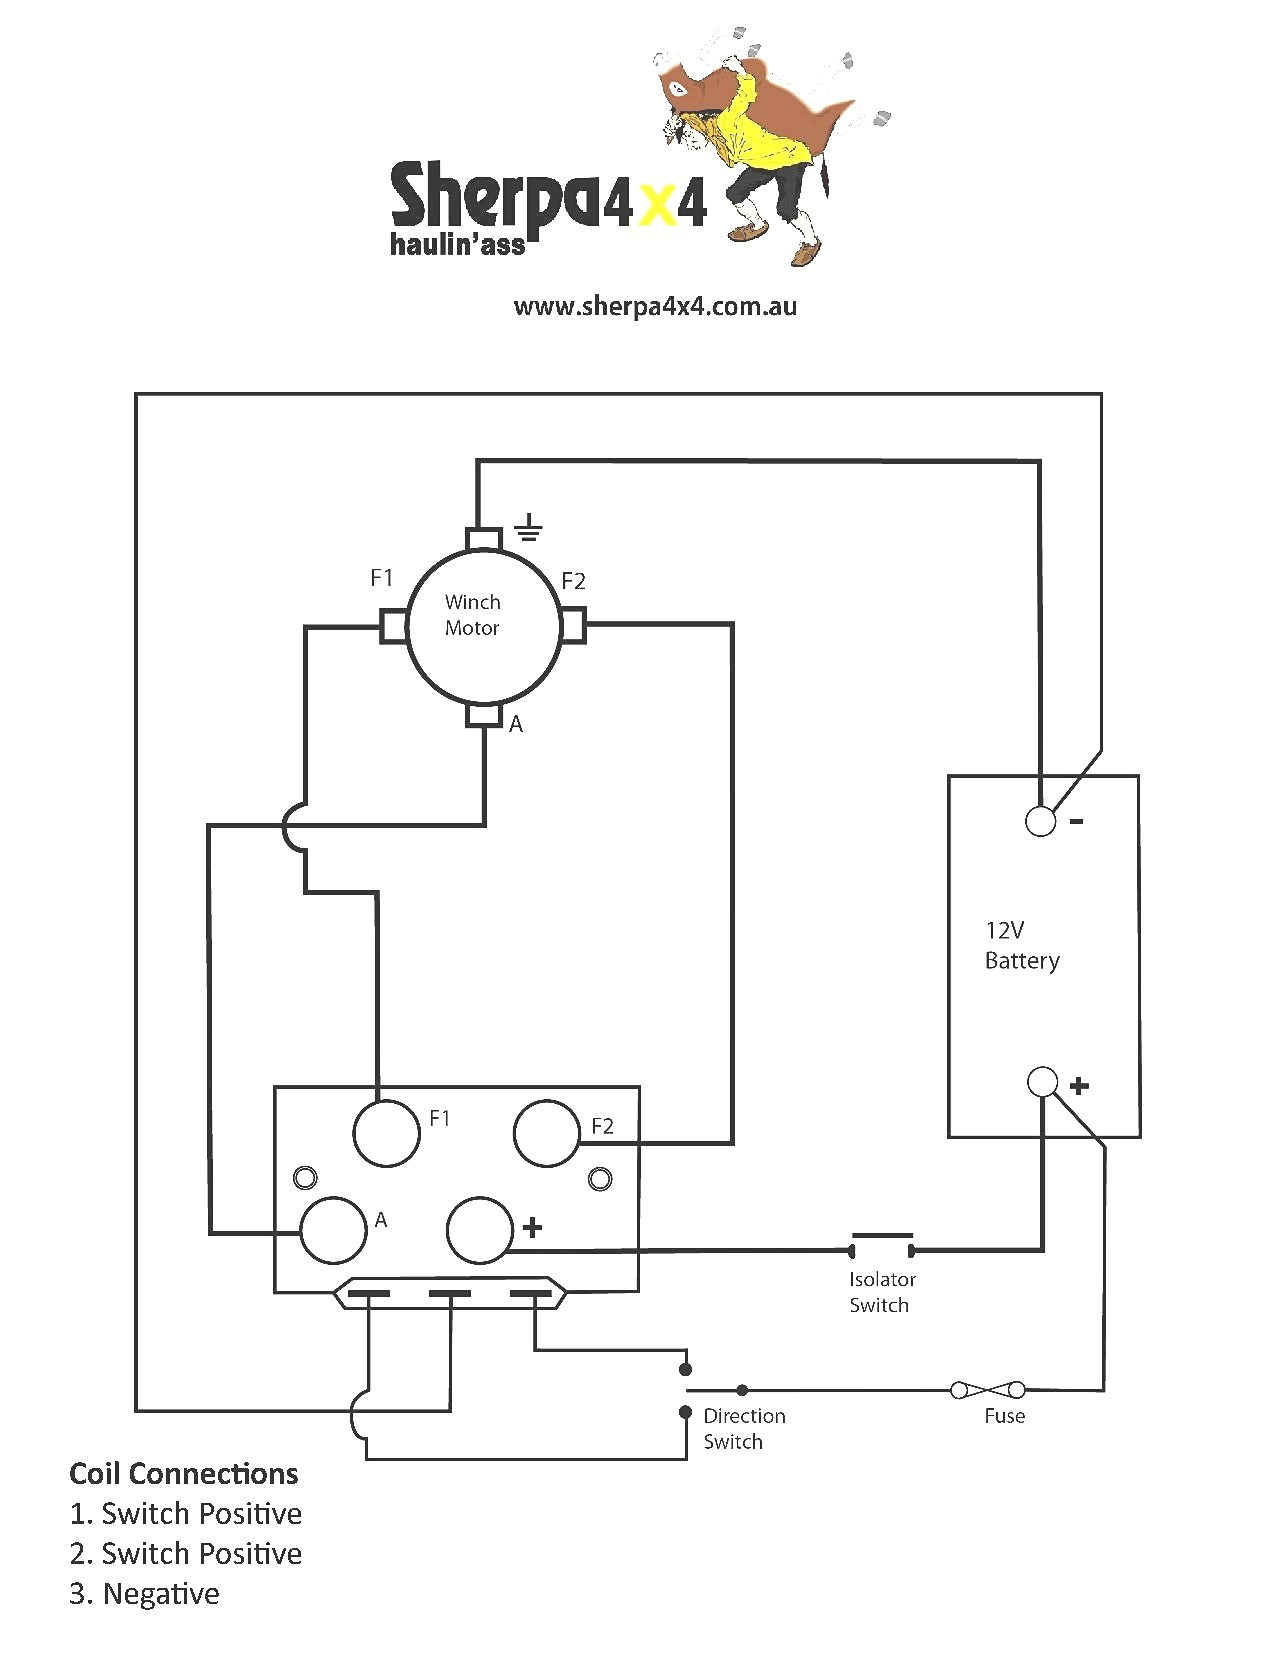 warn winch contactor wiring diagram